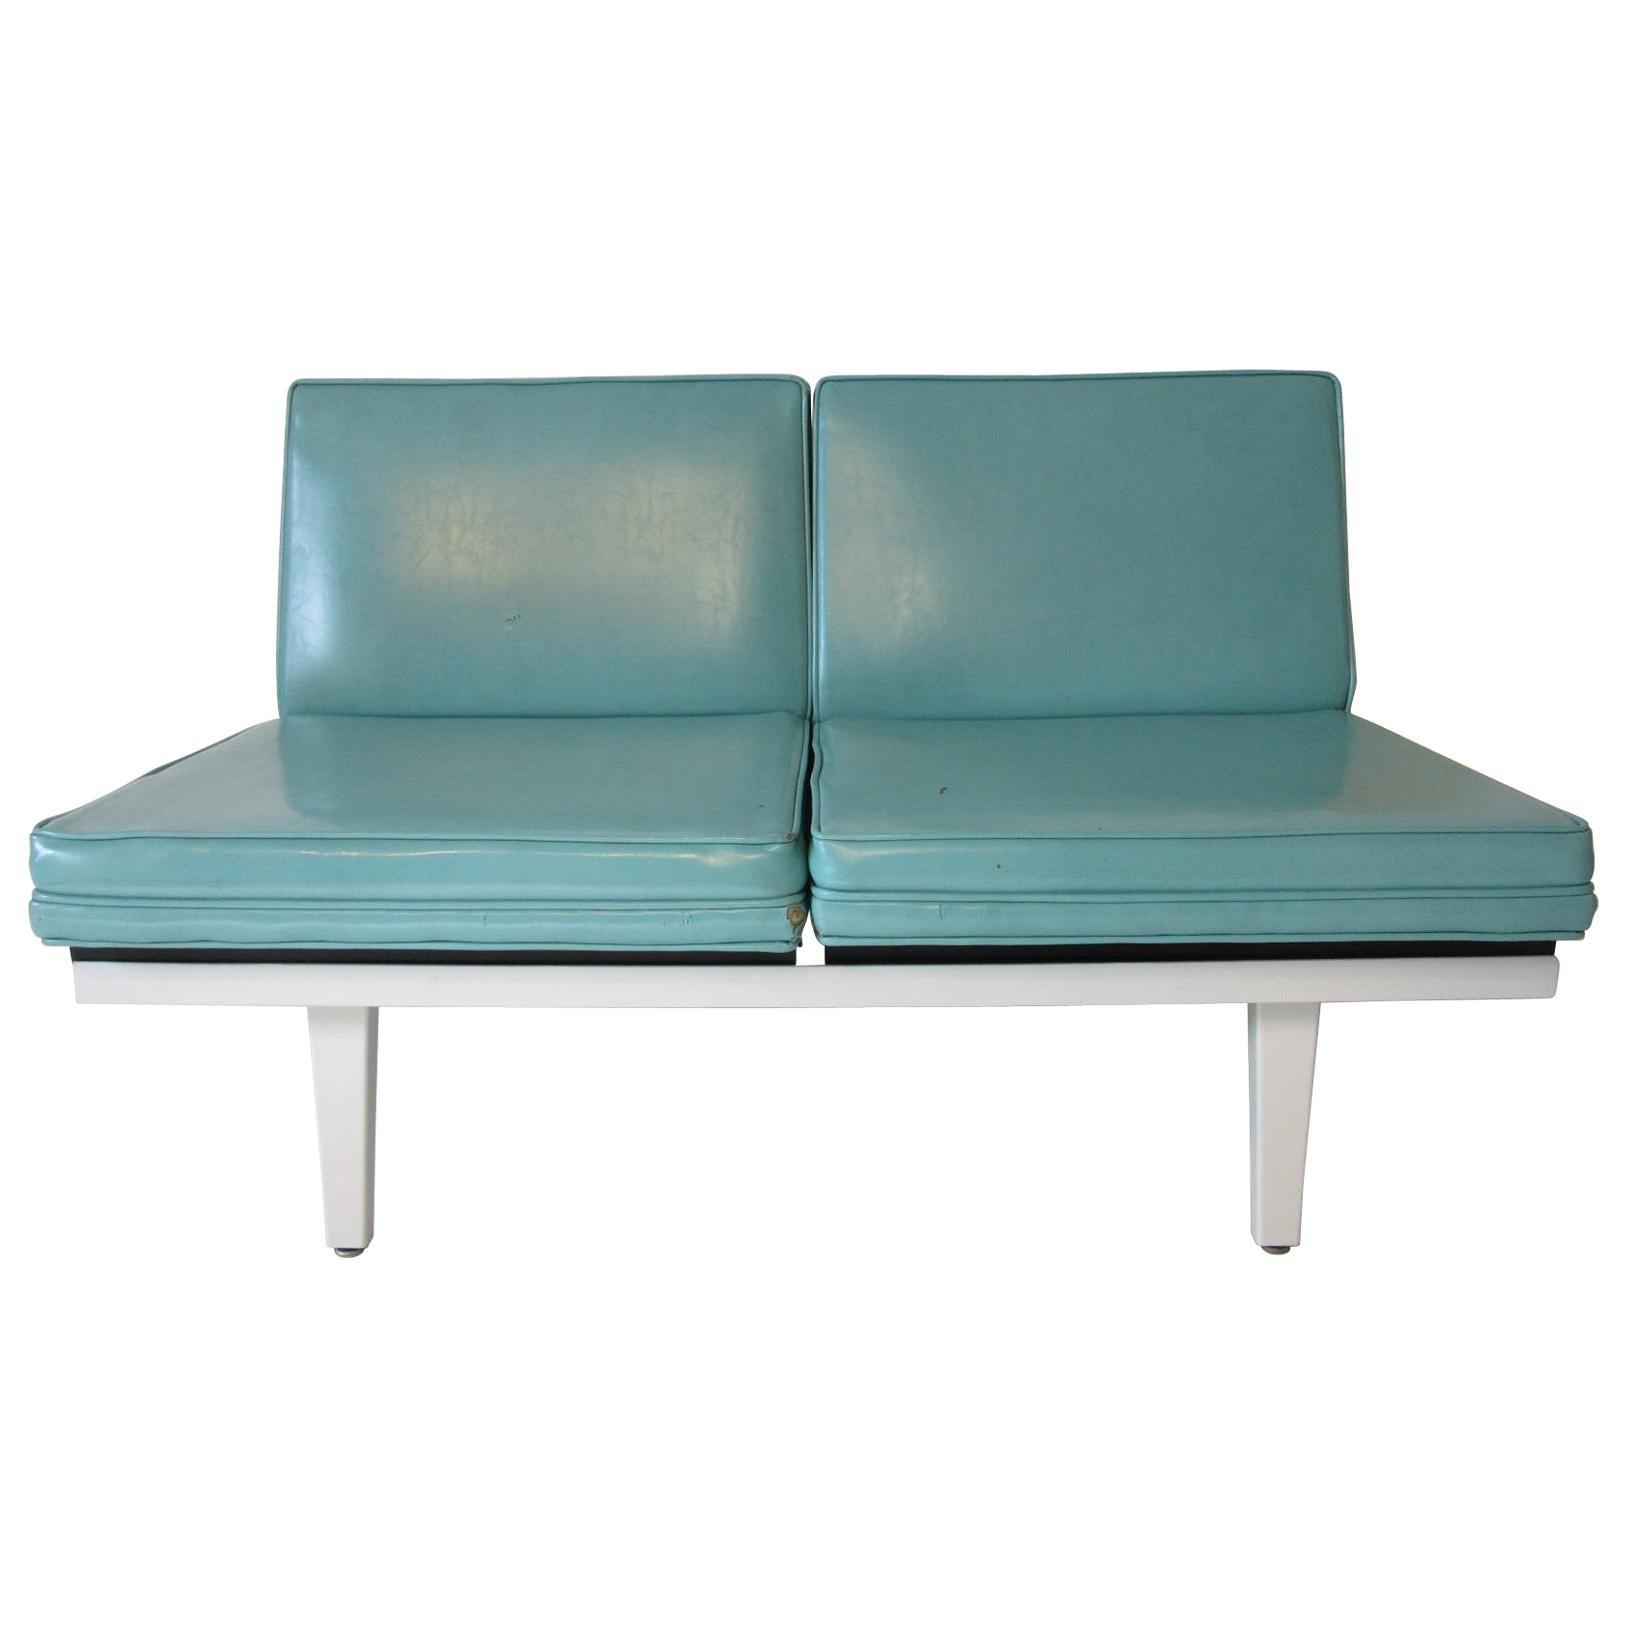 George Nelson Steel Frame Sofa - Loveseat by Herman Miller ( 1 )